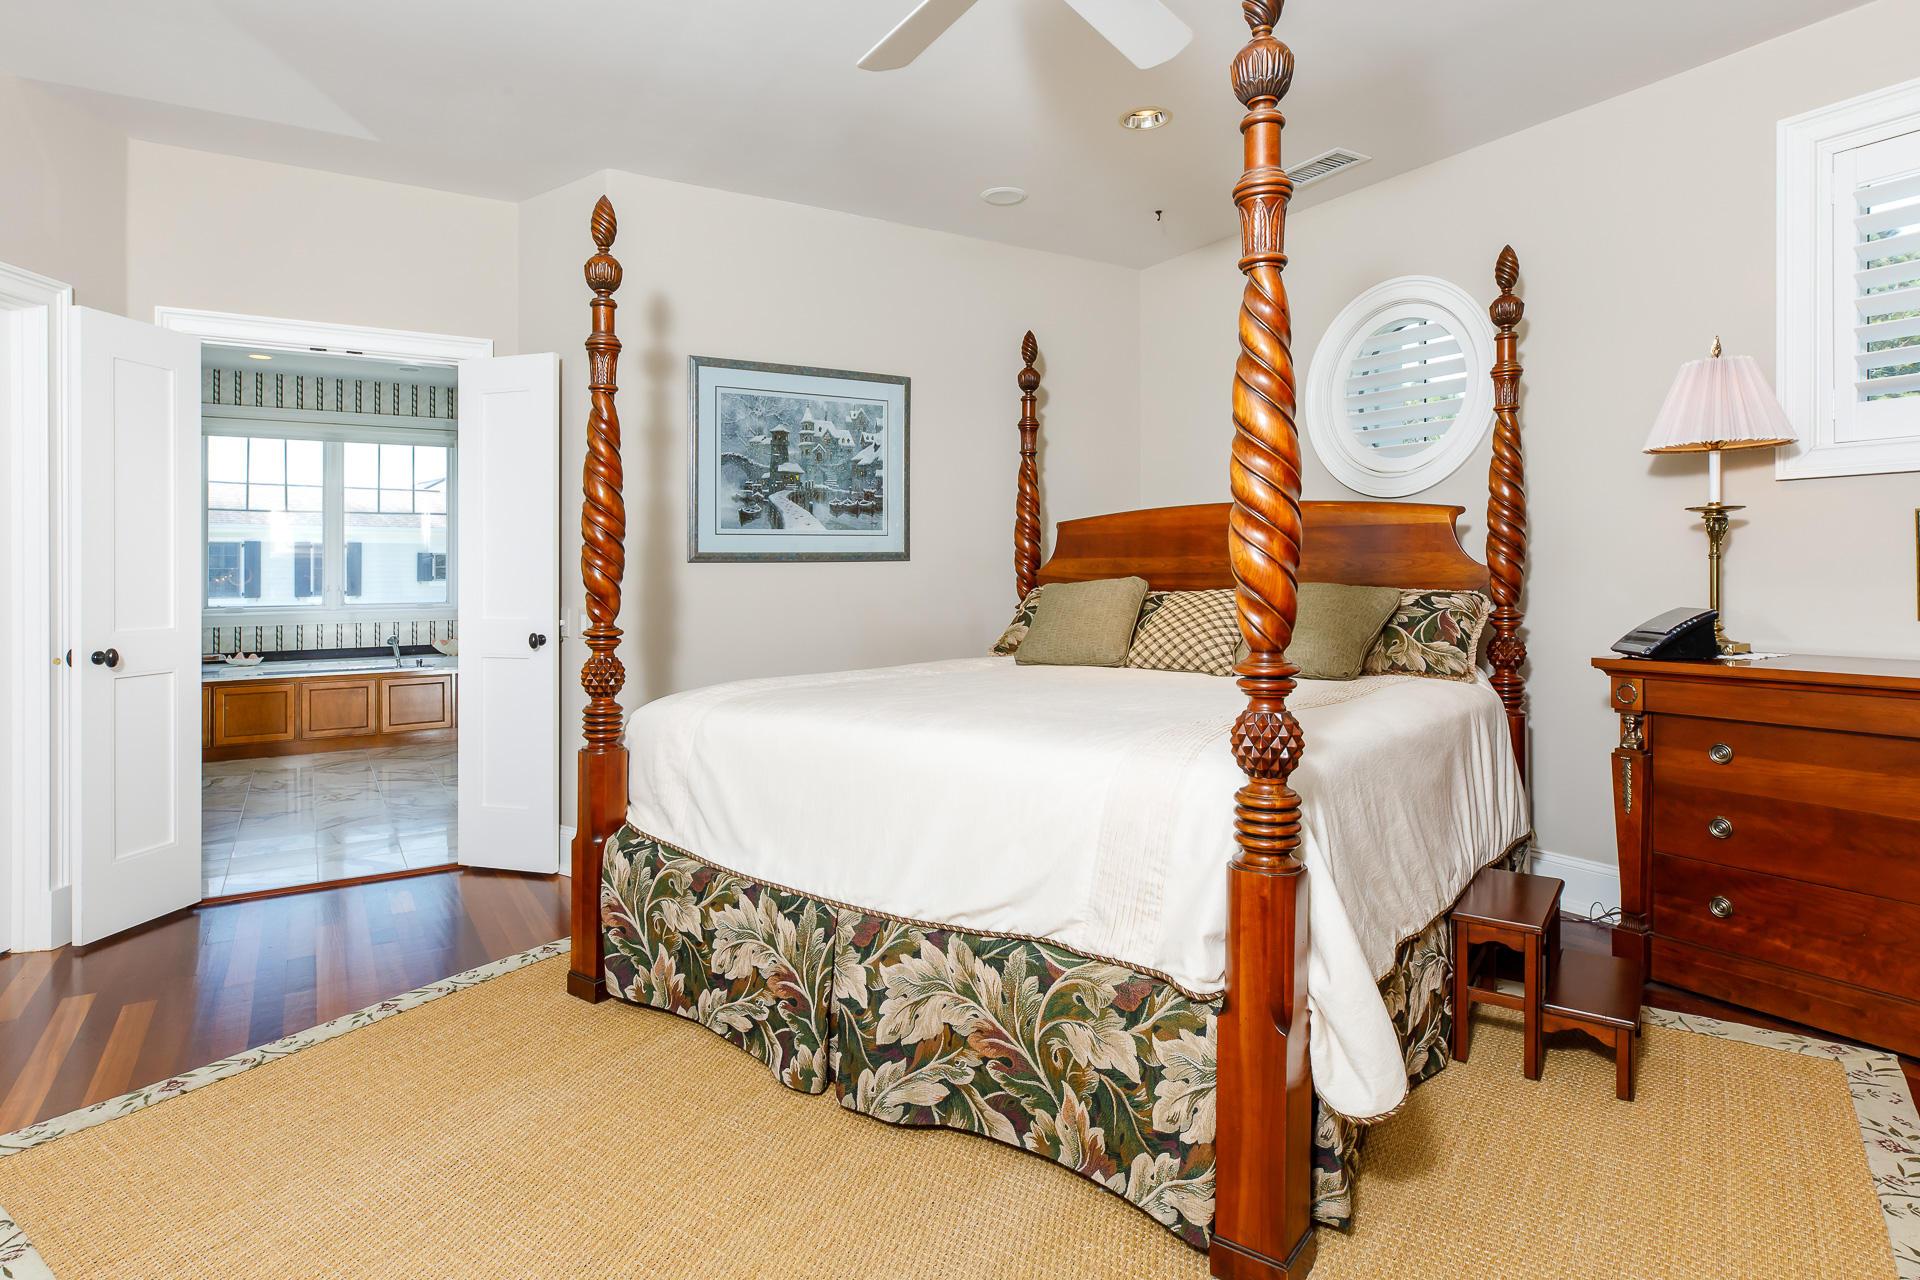 Seabrook Island Homes For Sale - 2216 Rolling Dune, Seabrook Island, SC - 5